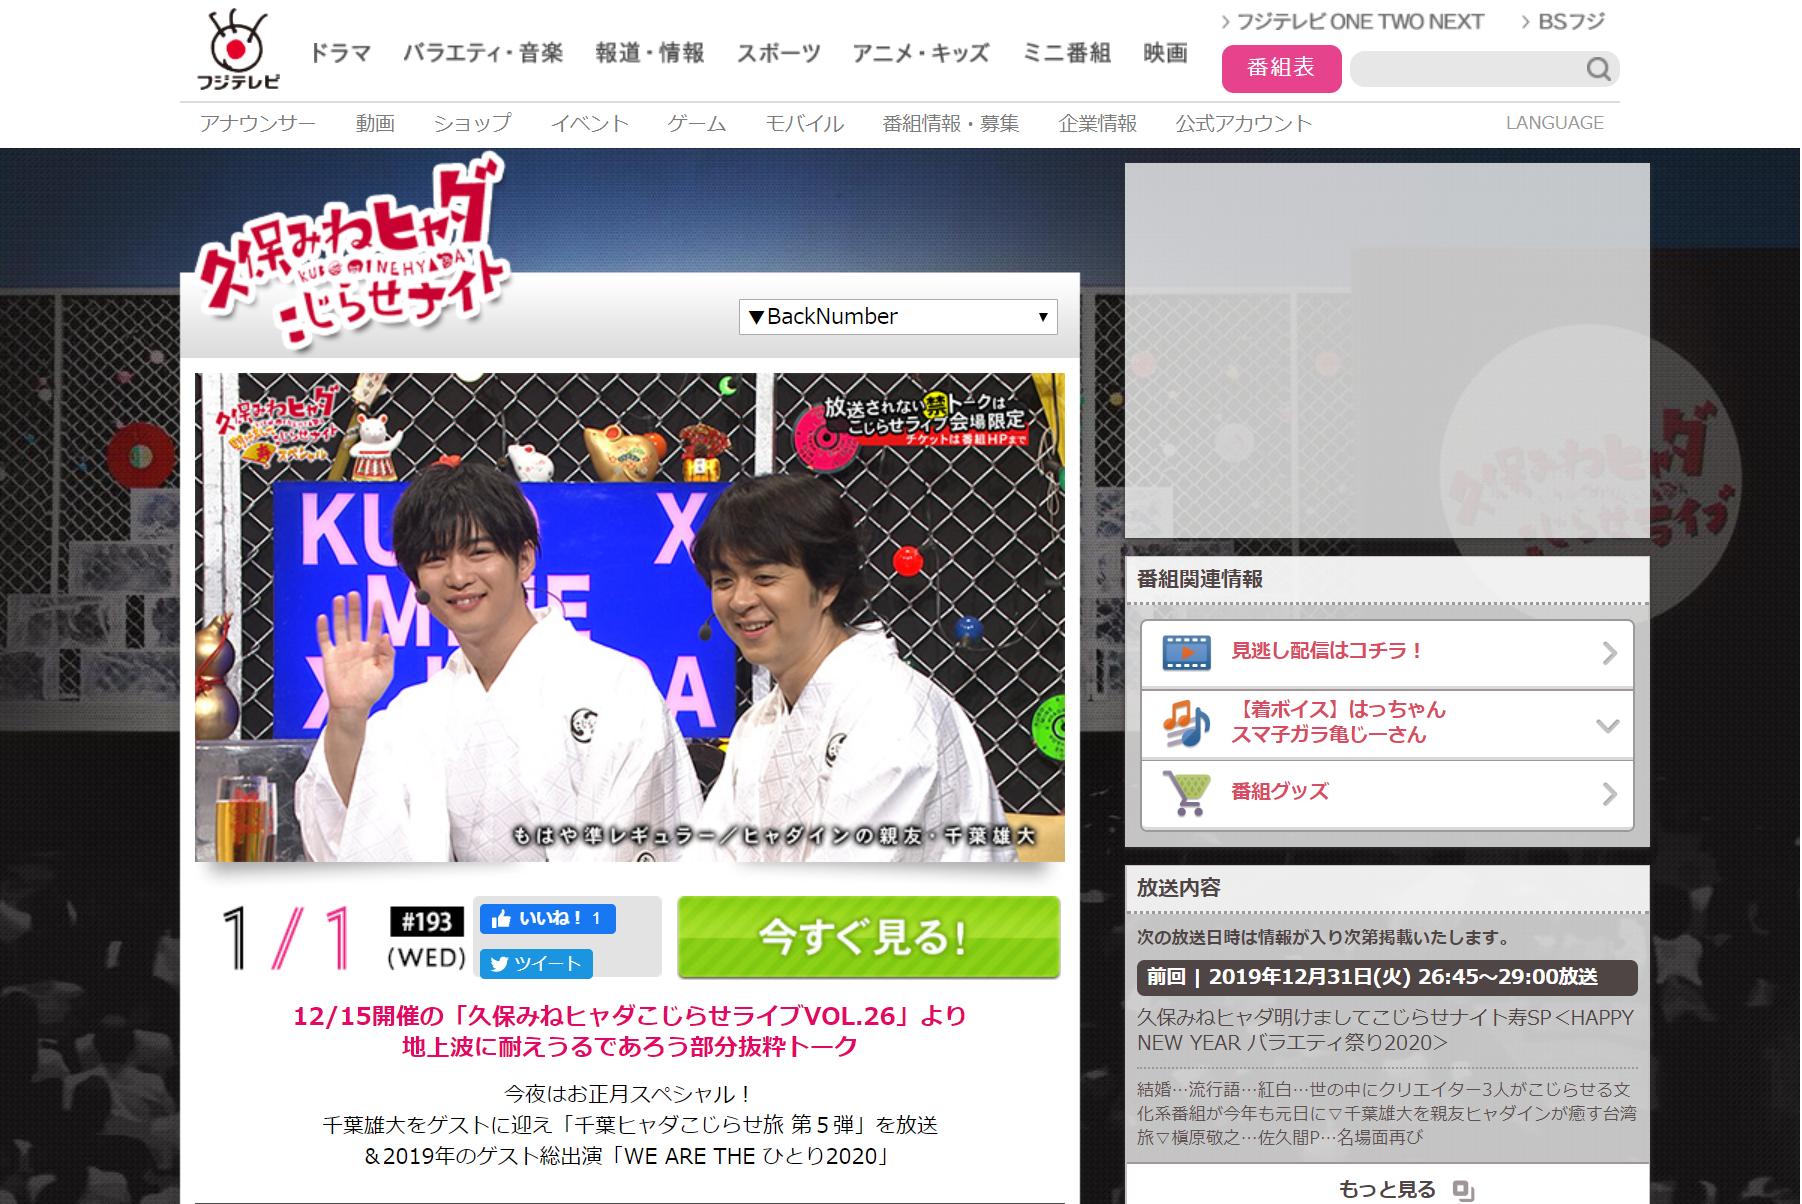 screencapture-fujitv-co-jp-kojirasenight-archive-200101-html-2020-01-04-23_48_13.png